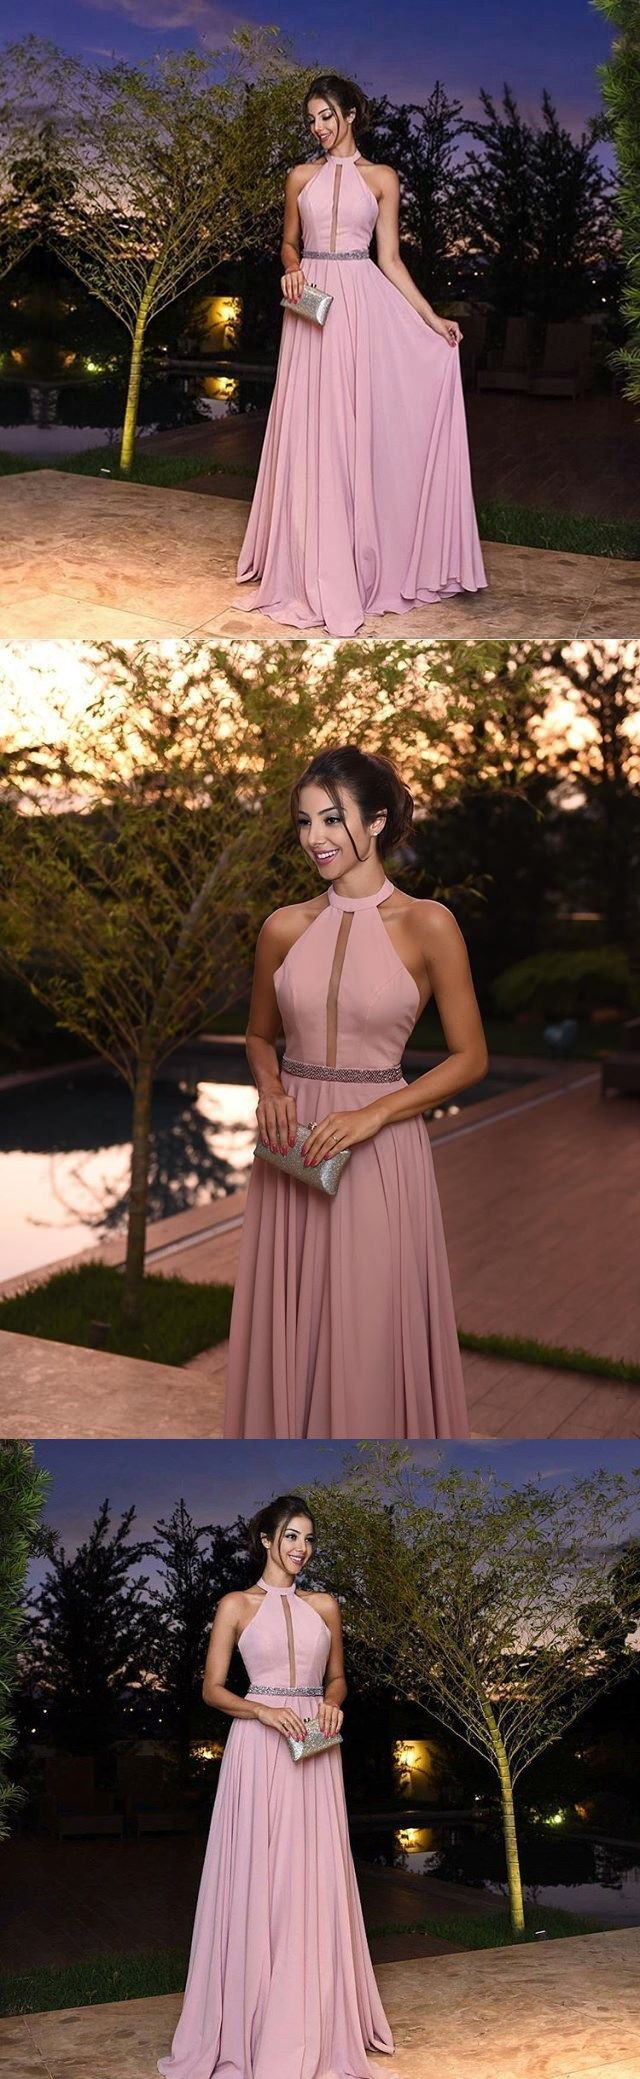 Chic prom dresses floorlength sparkly halter prom dress simple